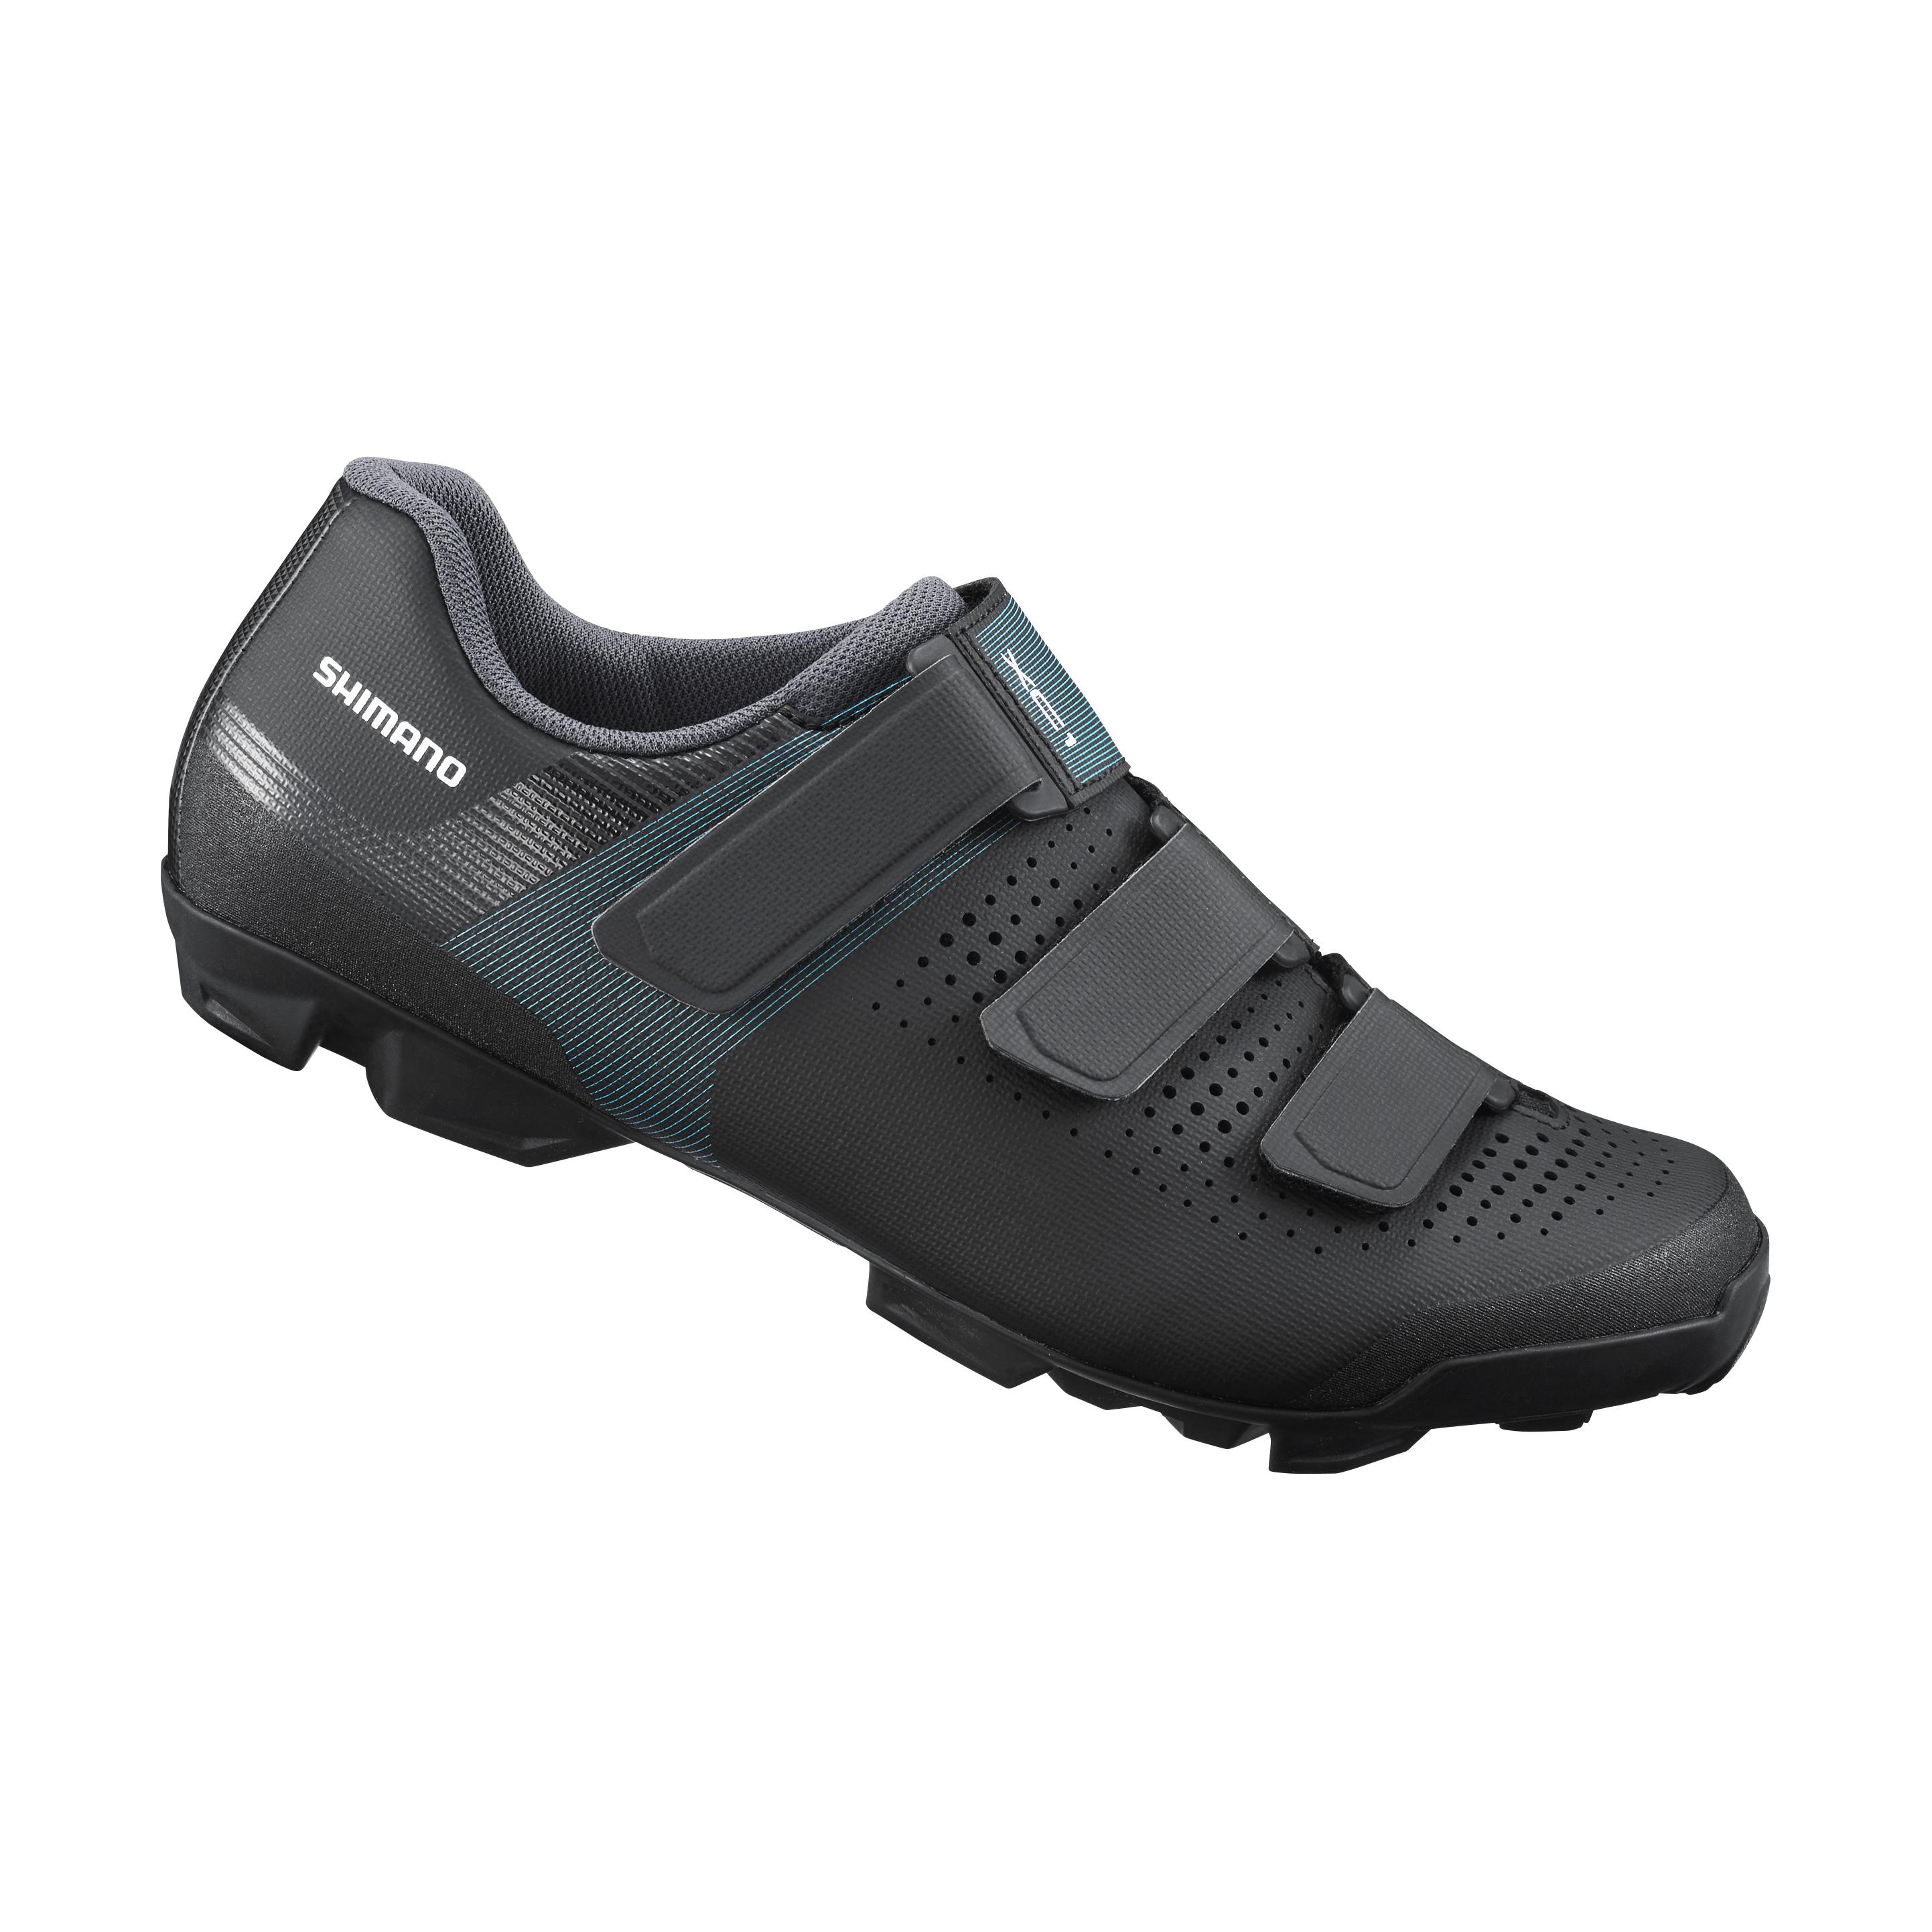 SHIMANO MTB obuv SH-XC100W, dámská, černá, 36